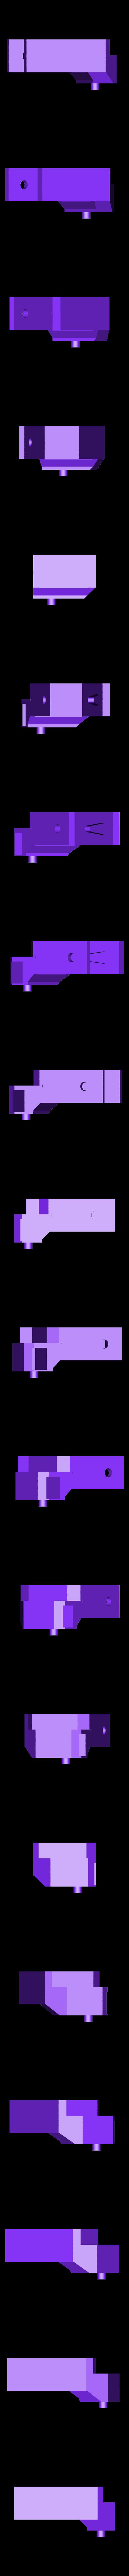 Leg_L_Top.stl Download free STL file Quadruped Walker Robot • 3D print object, indigo4